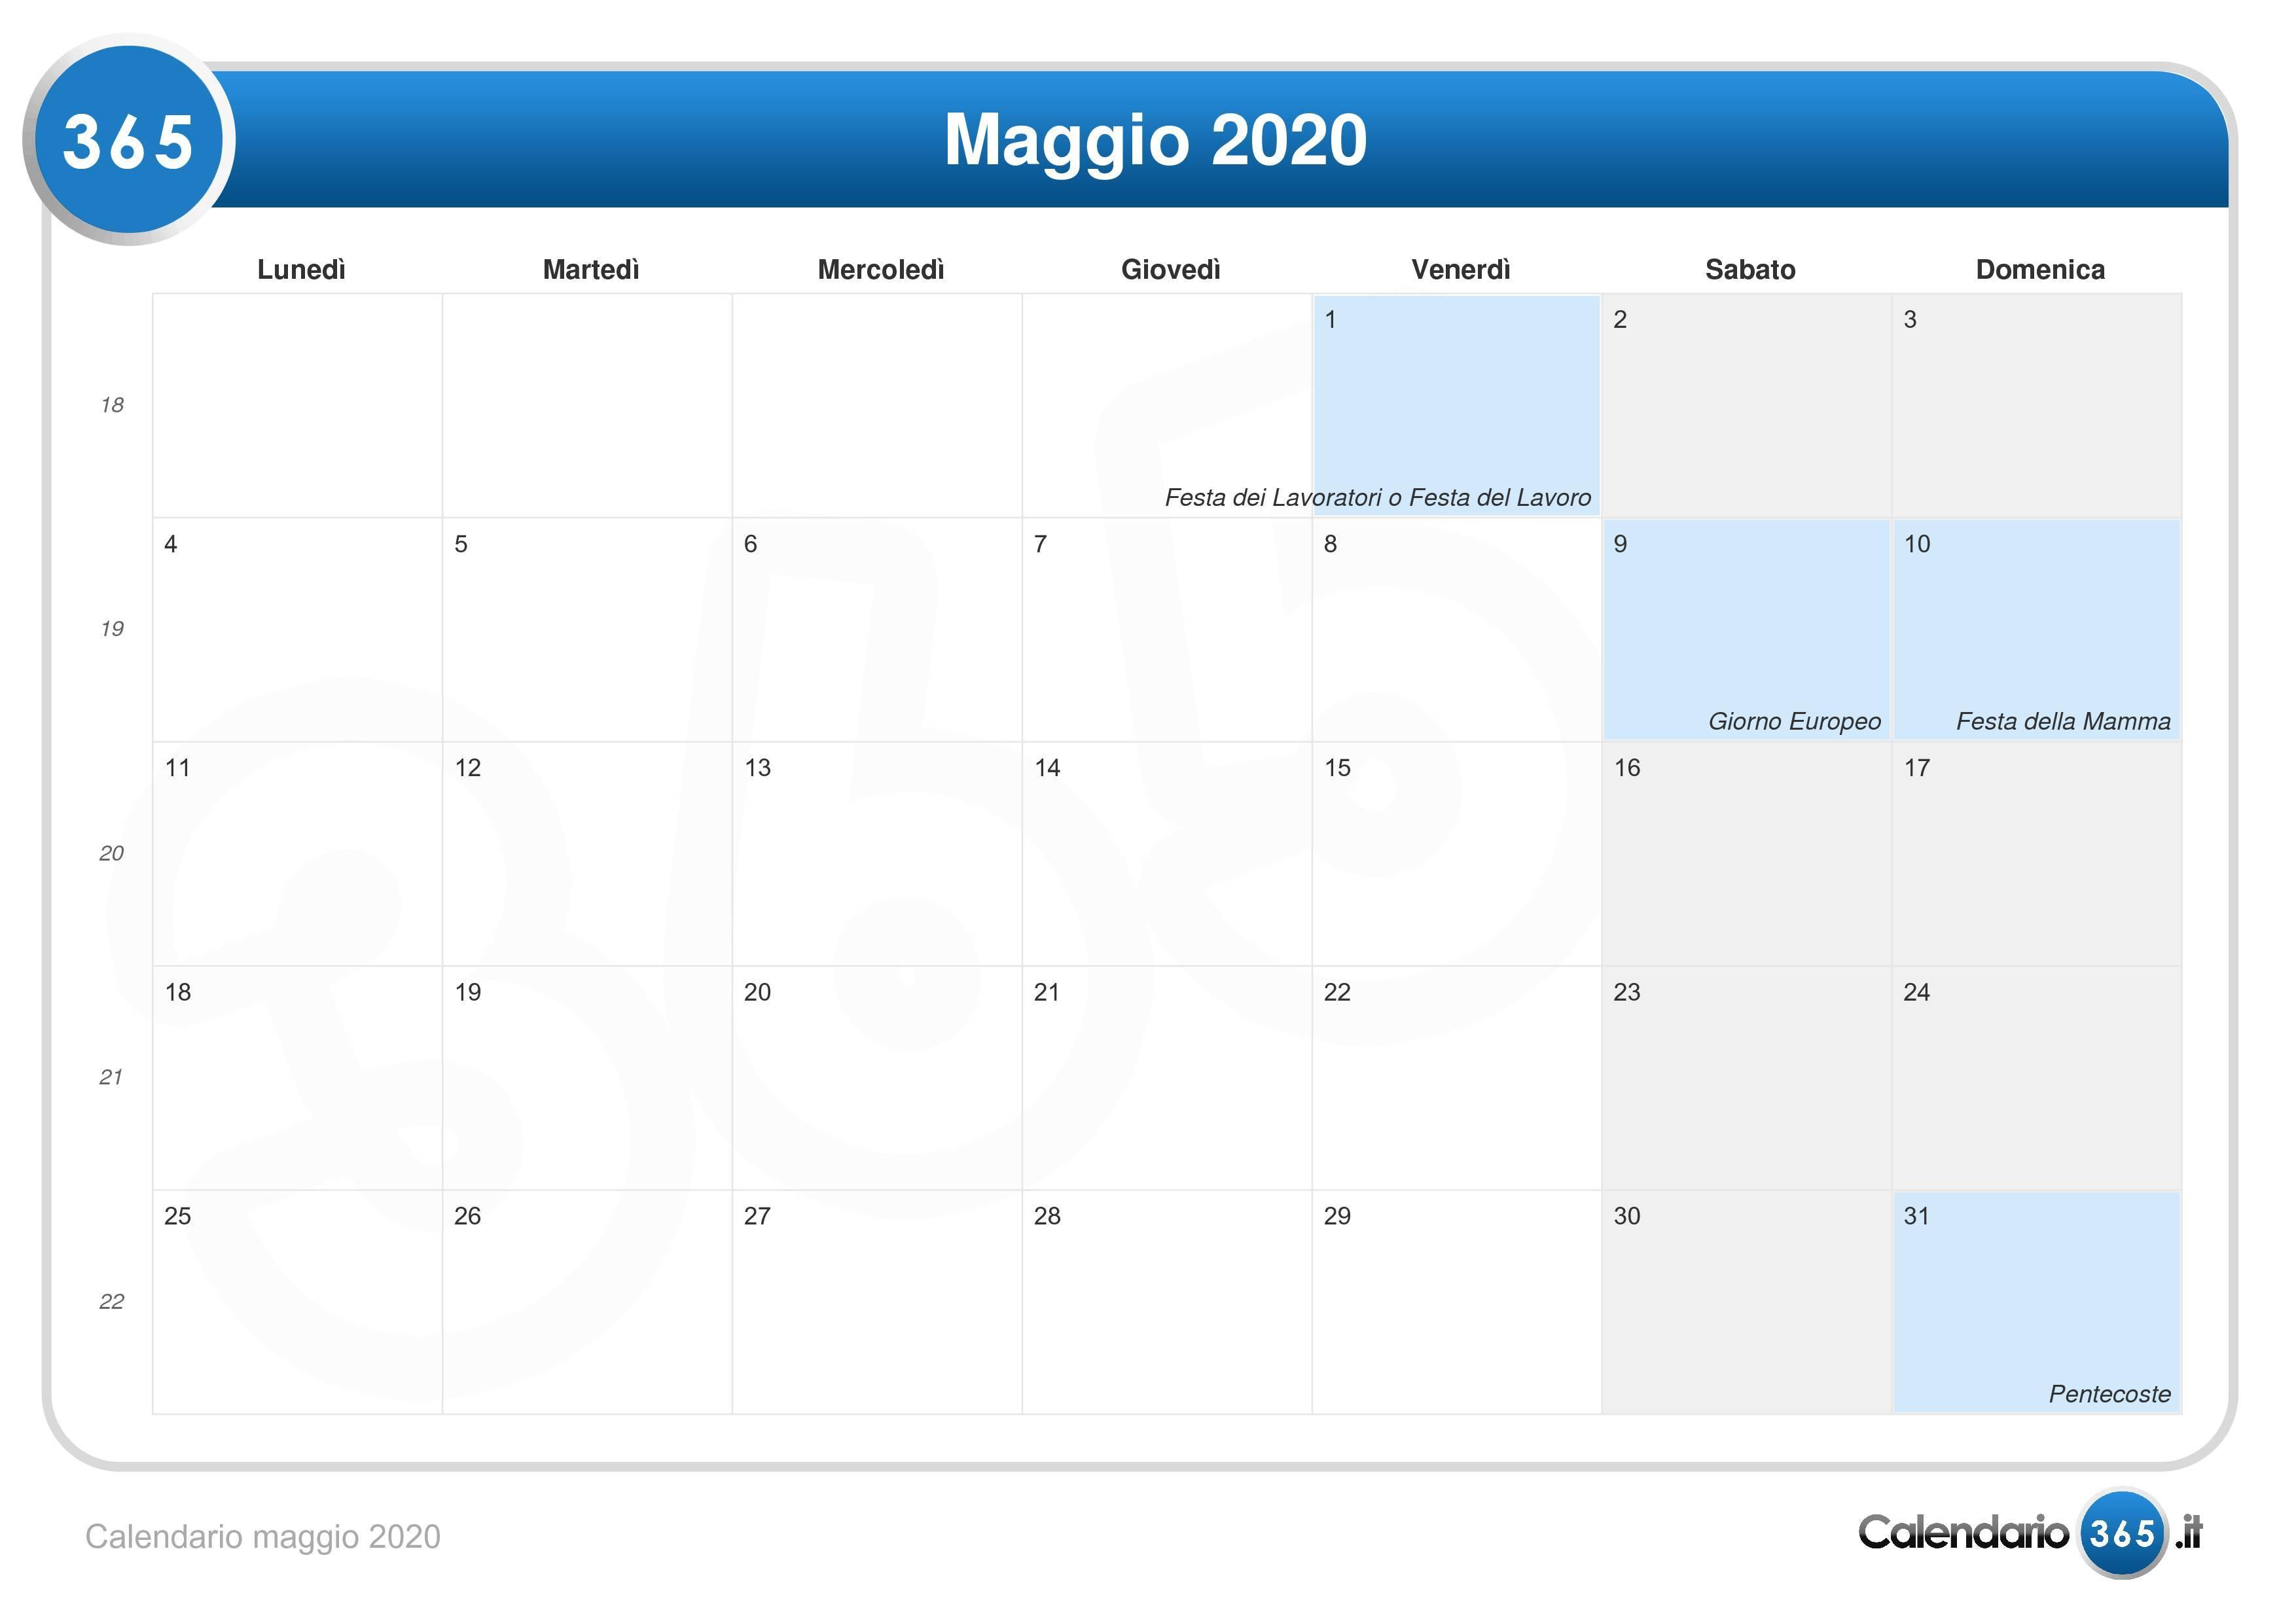 Calendario Maggio 2020.Calendario Maggio 2020